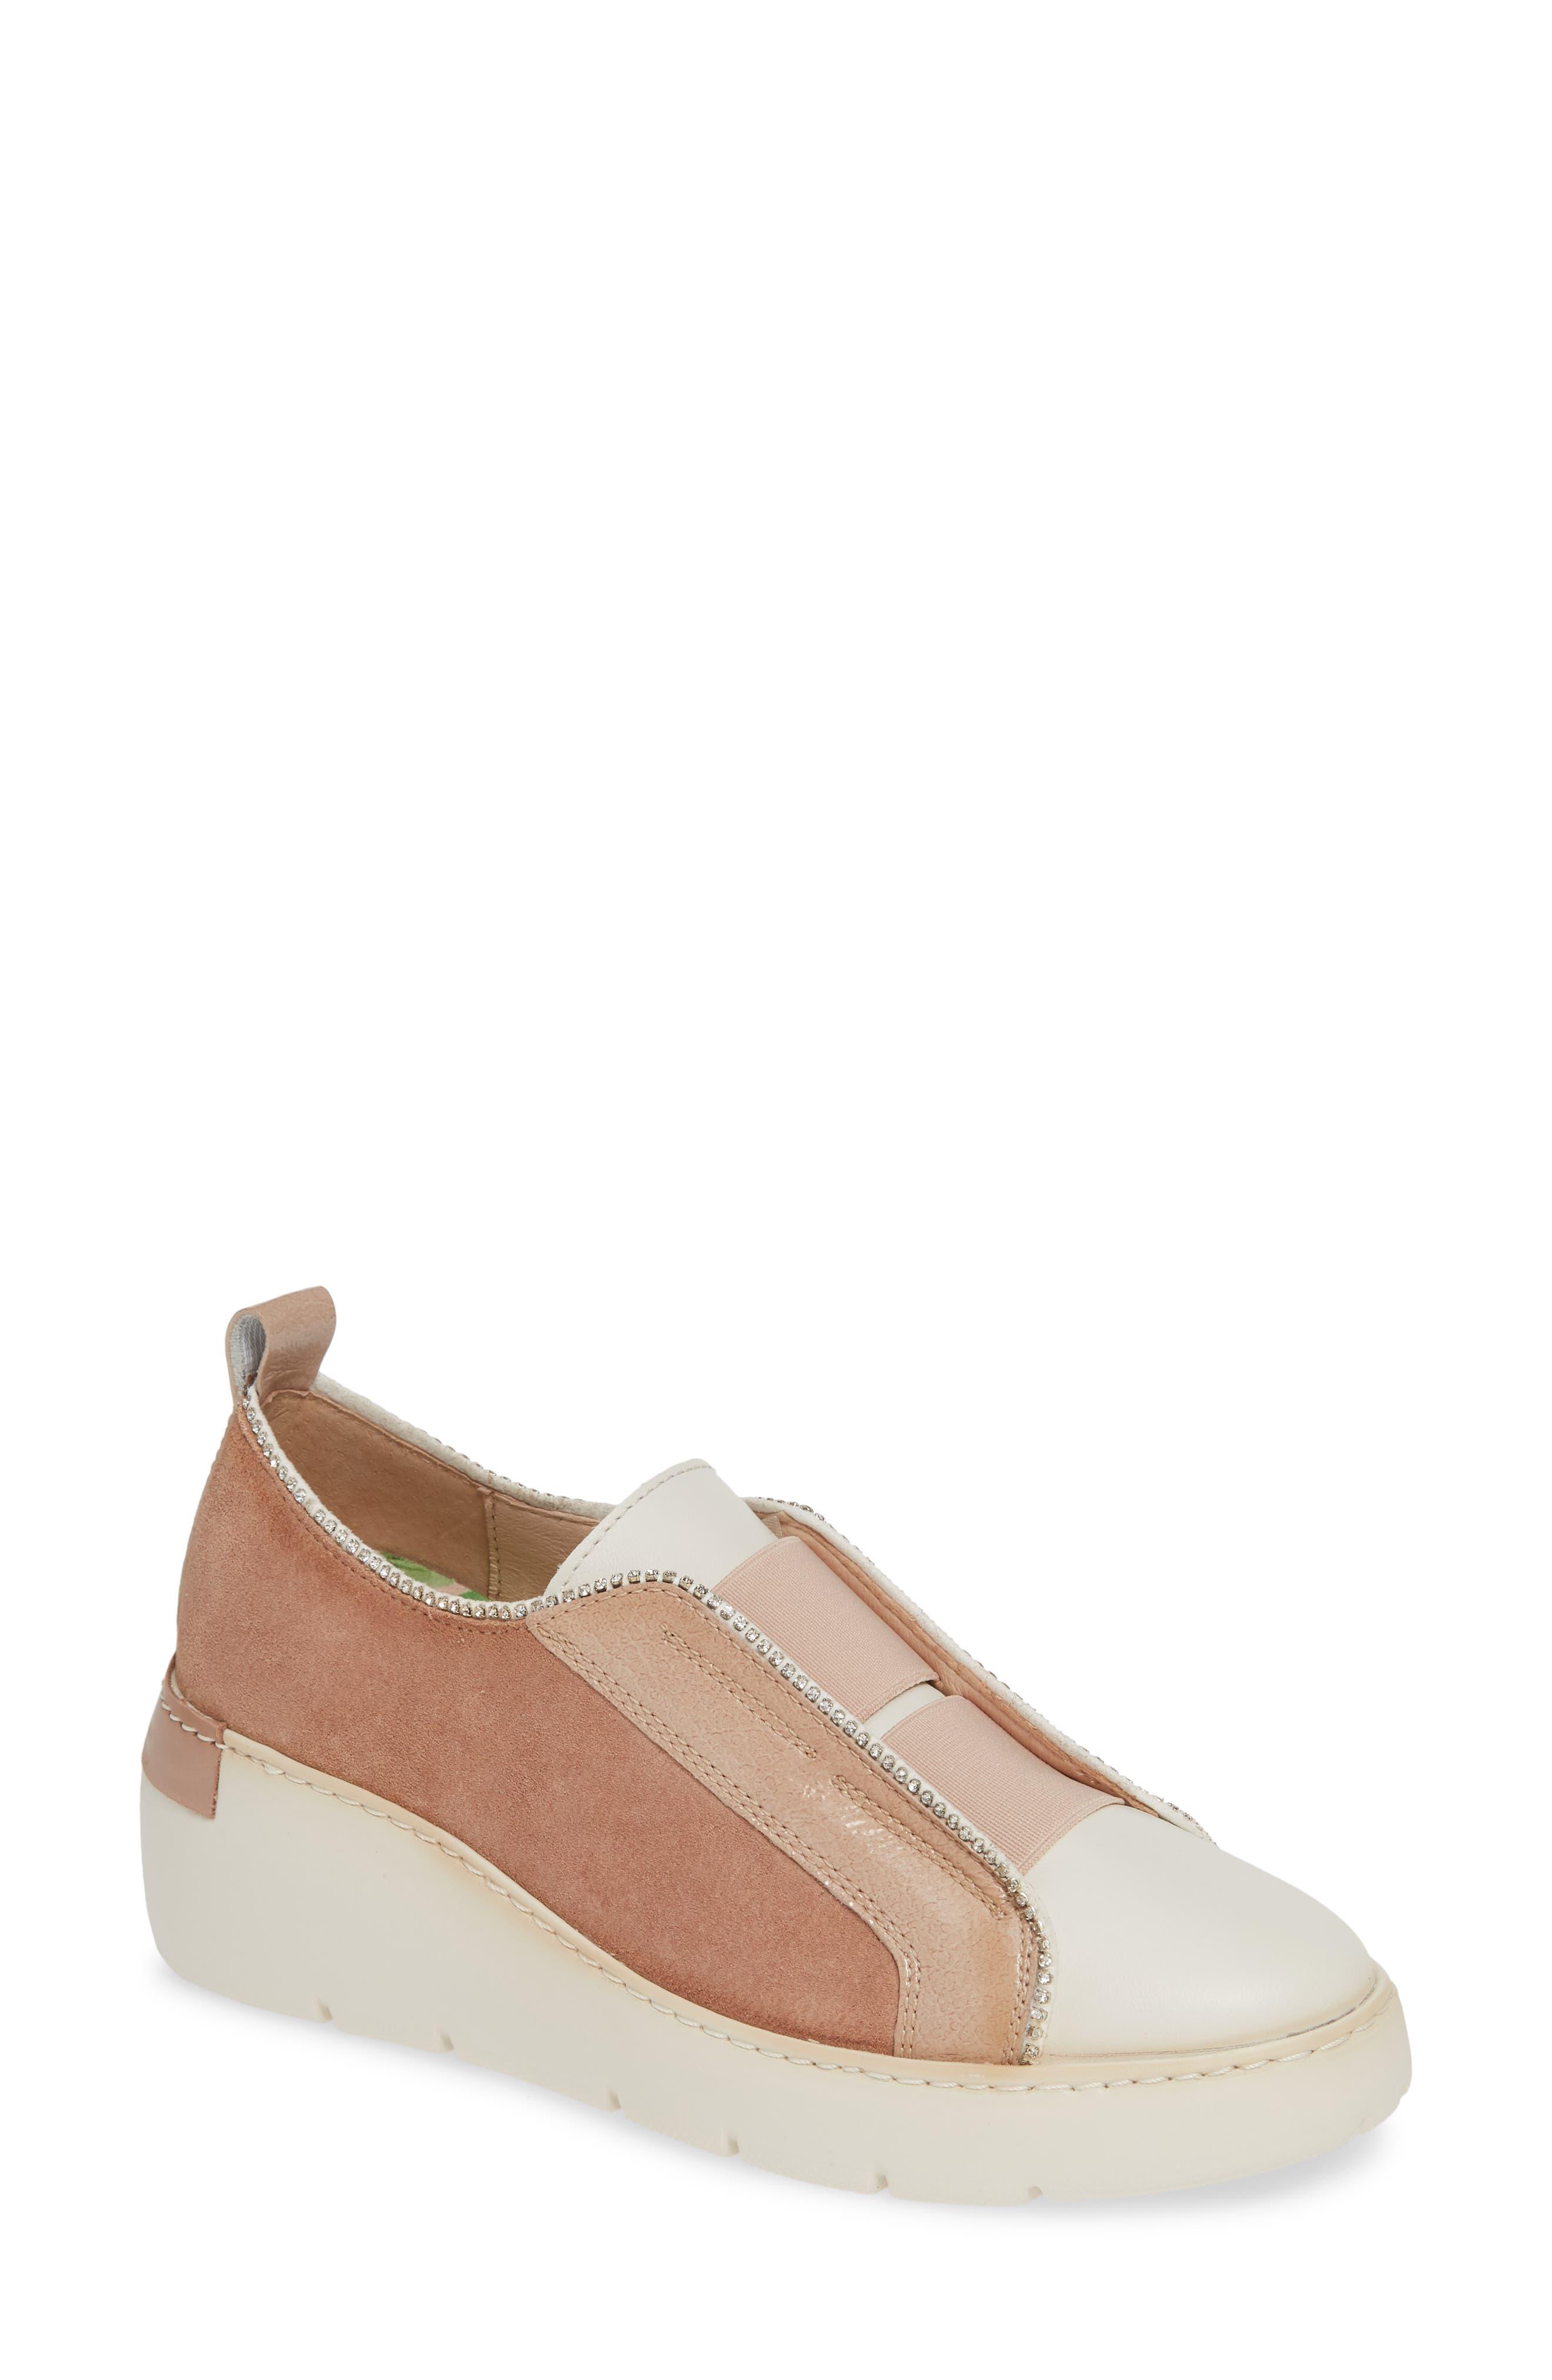 Hispanitas Benton Slip-On Wedge Sneaker - Brown